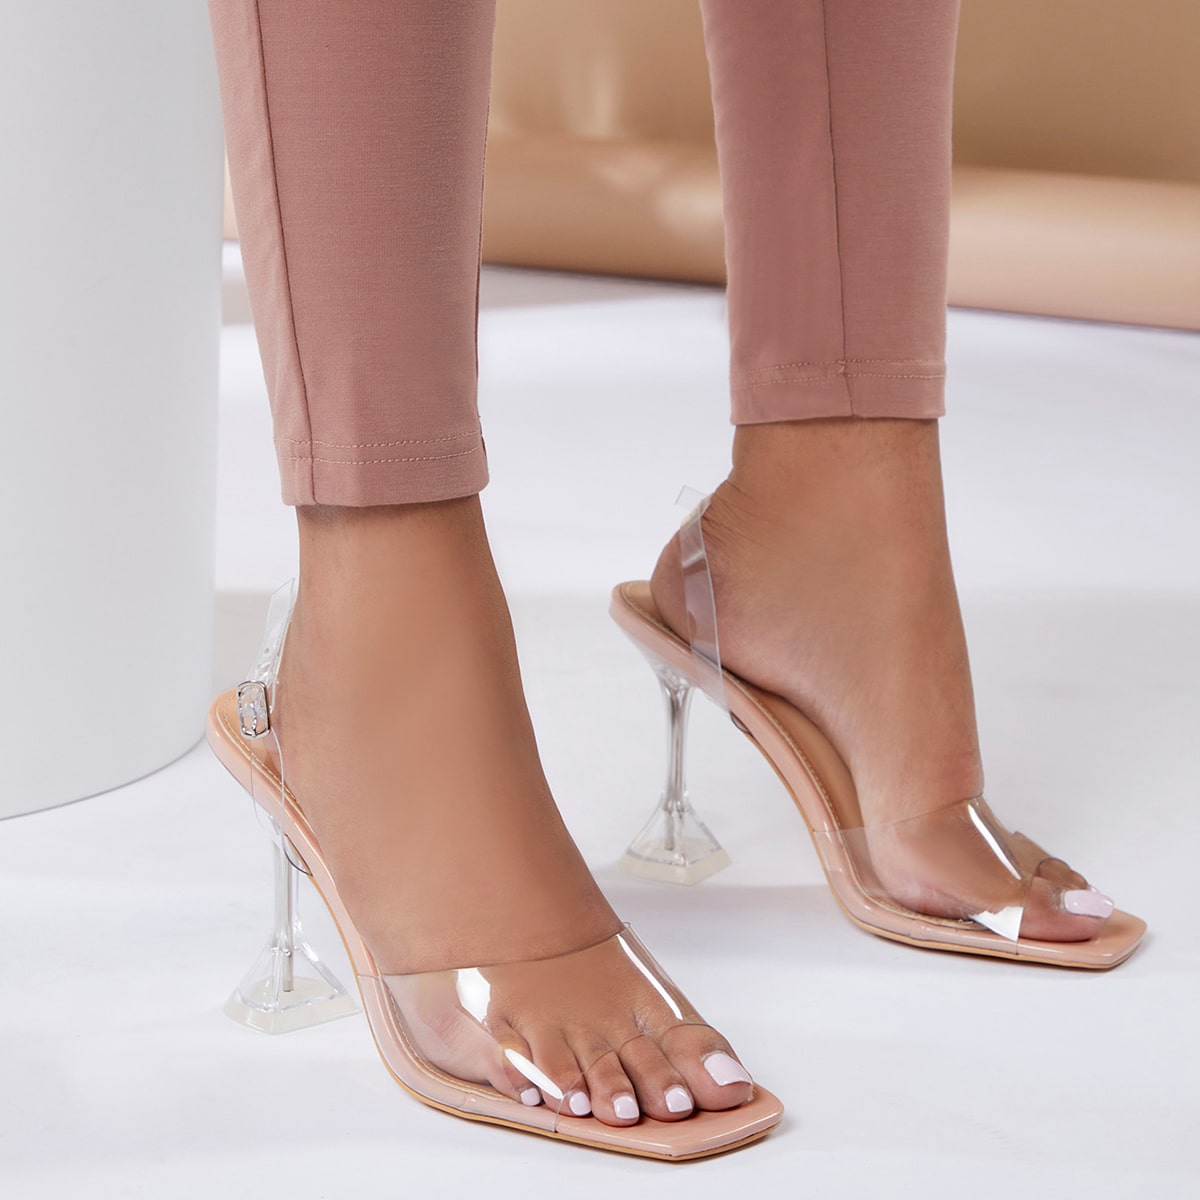 Прозрачные сандалии